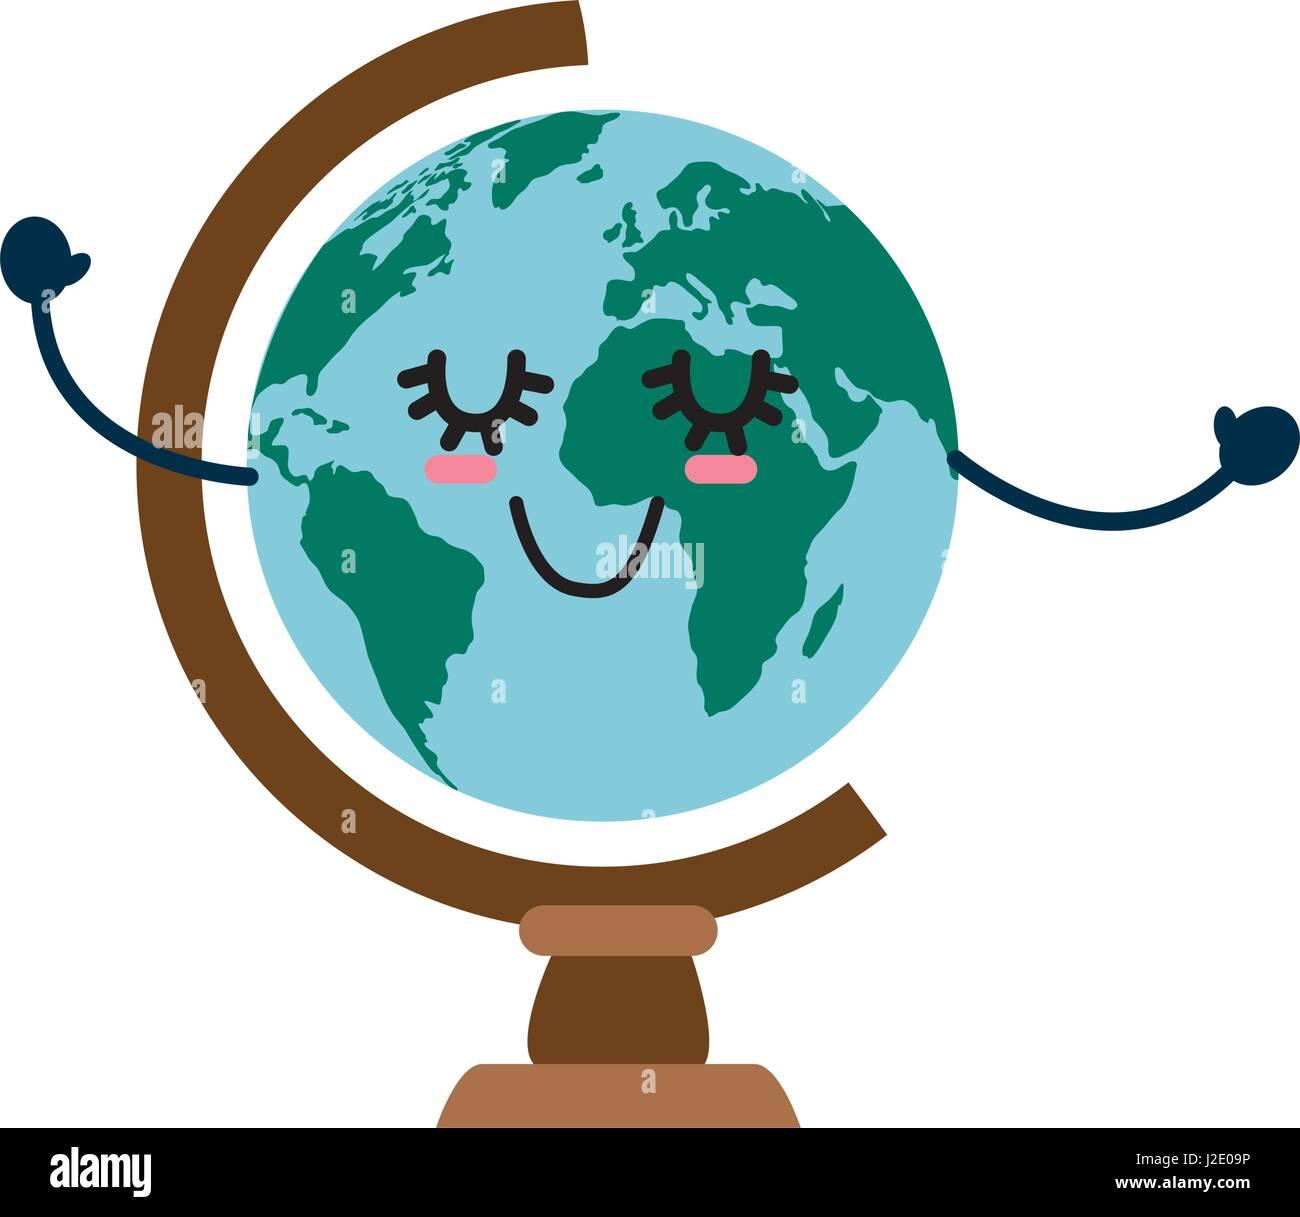 World globe cartoon stock photos world globe cartoon stock images world globe cartoon gumiabroncs Gallery